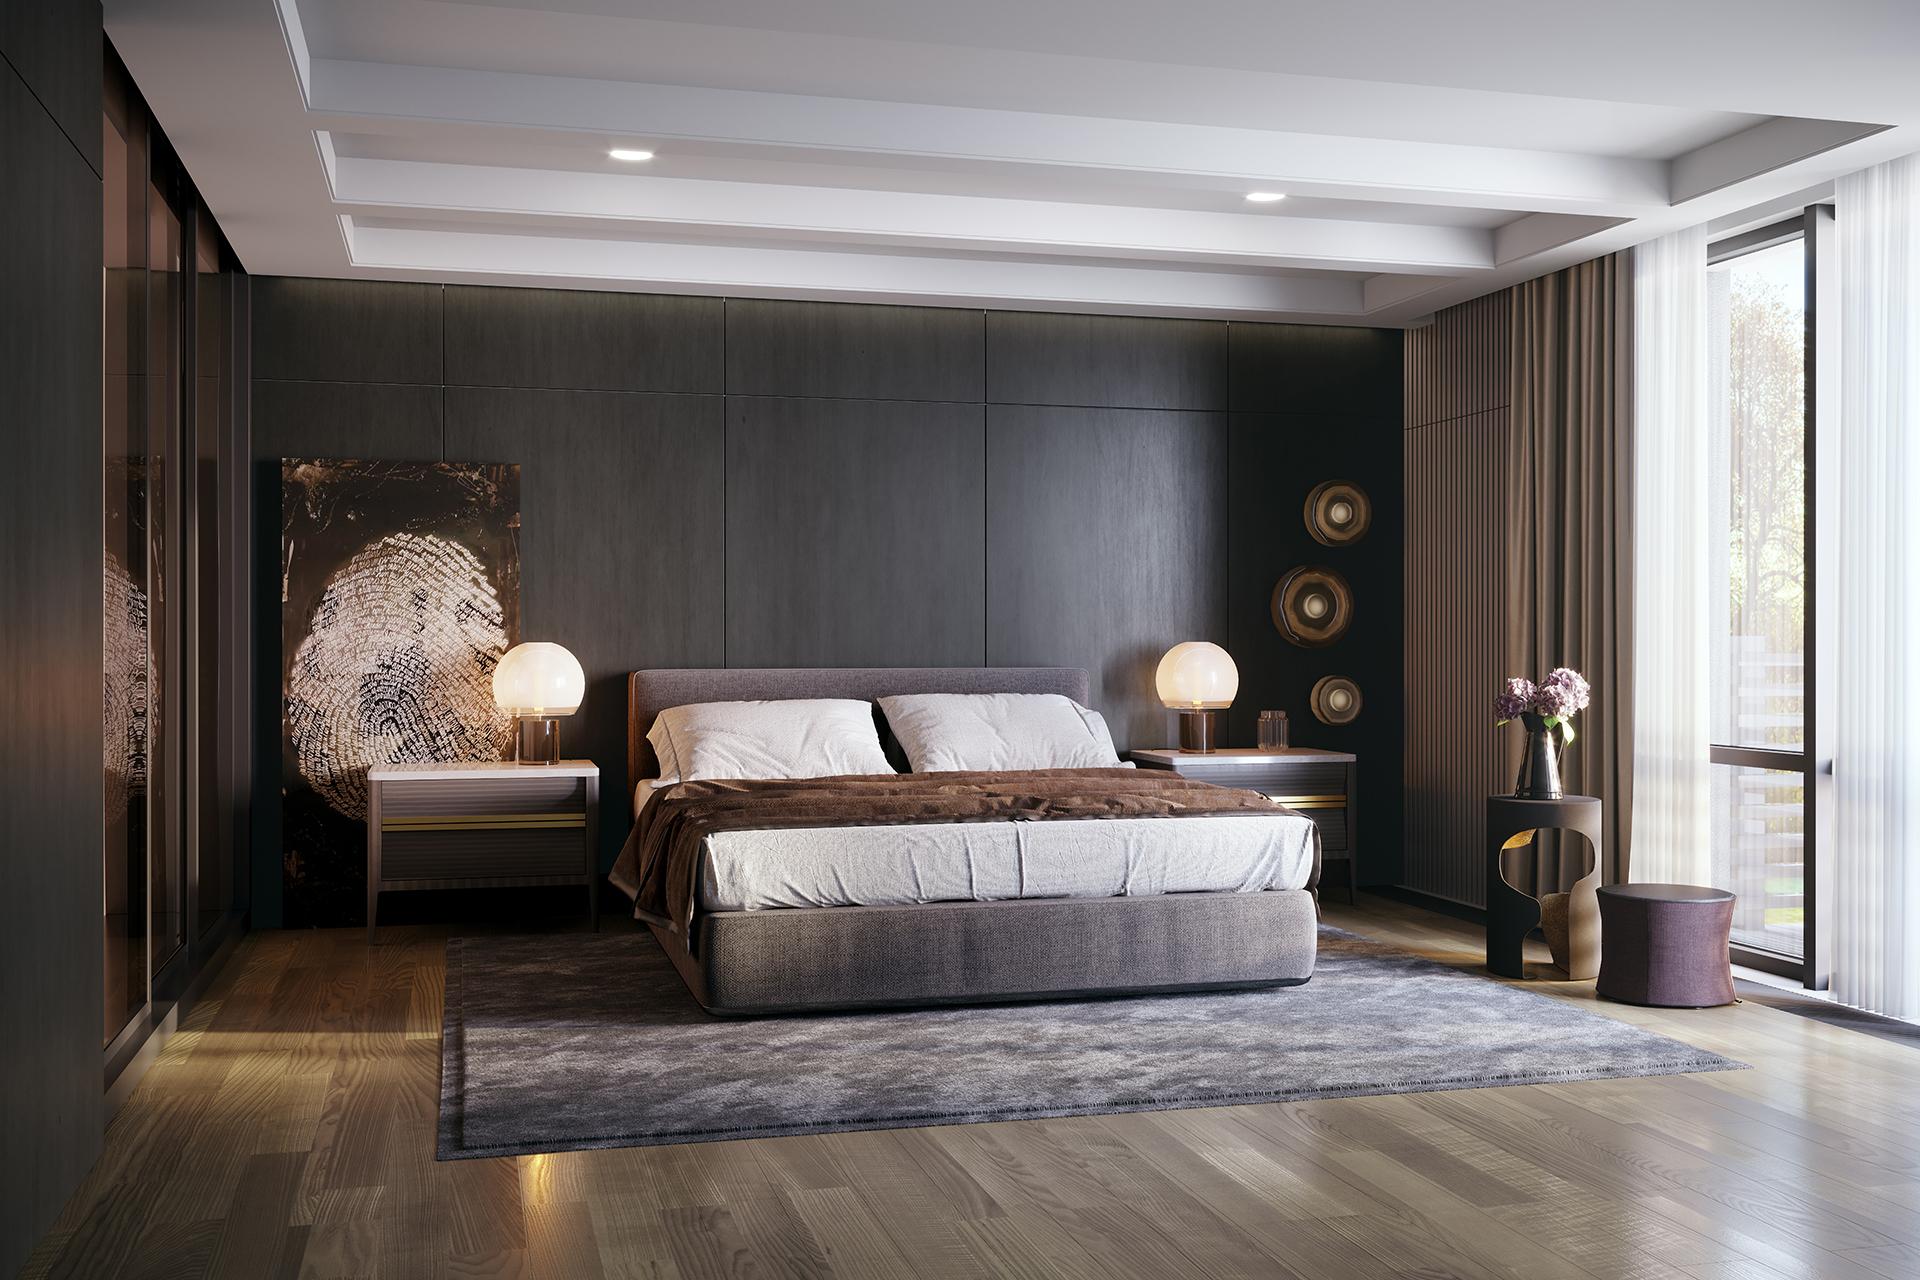 FINAL_Brookside_Bedroom-10k-2019-02-12.jpg